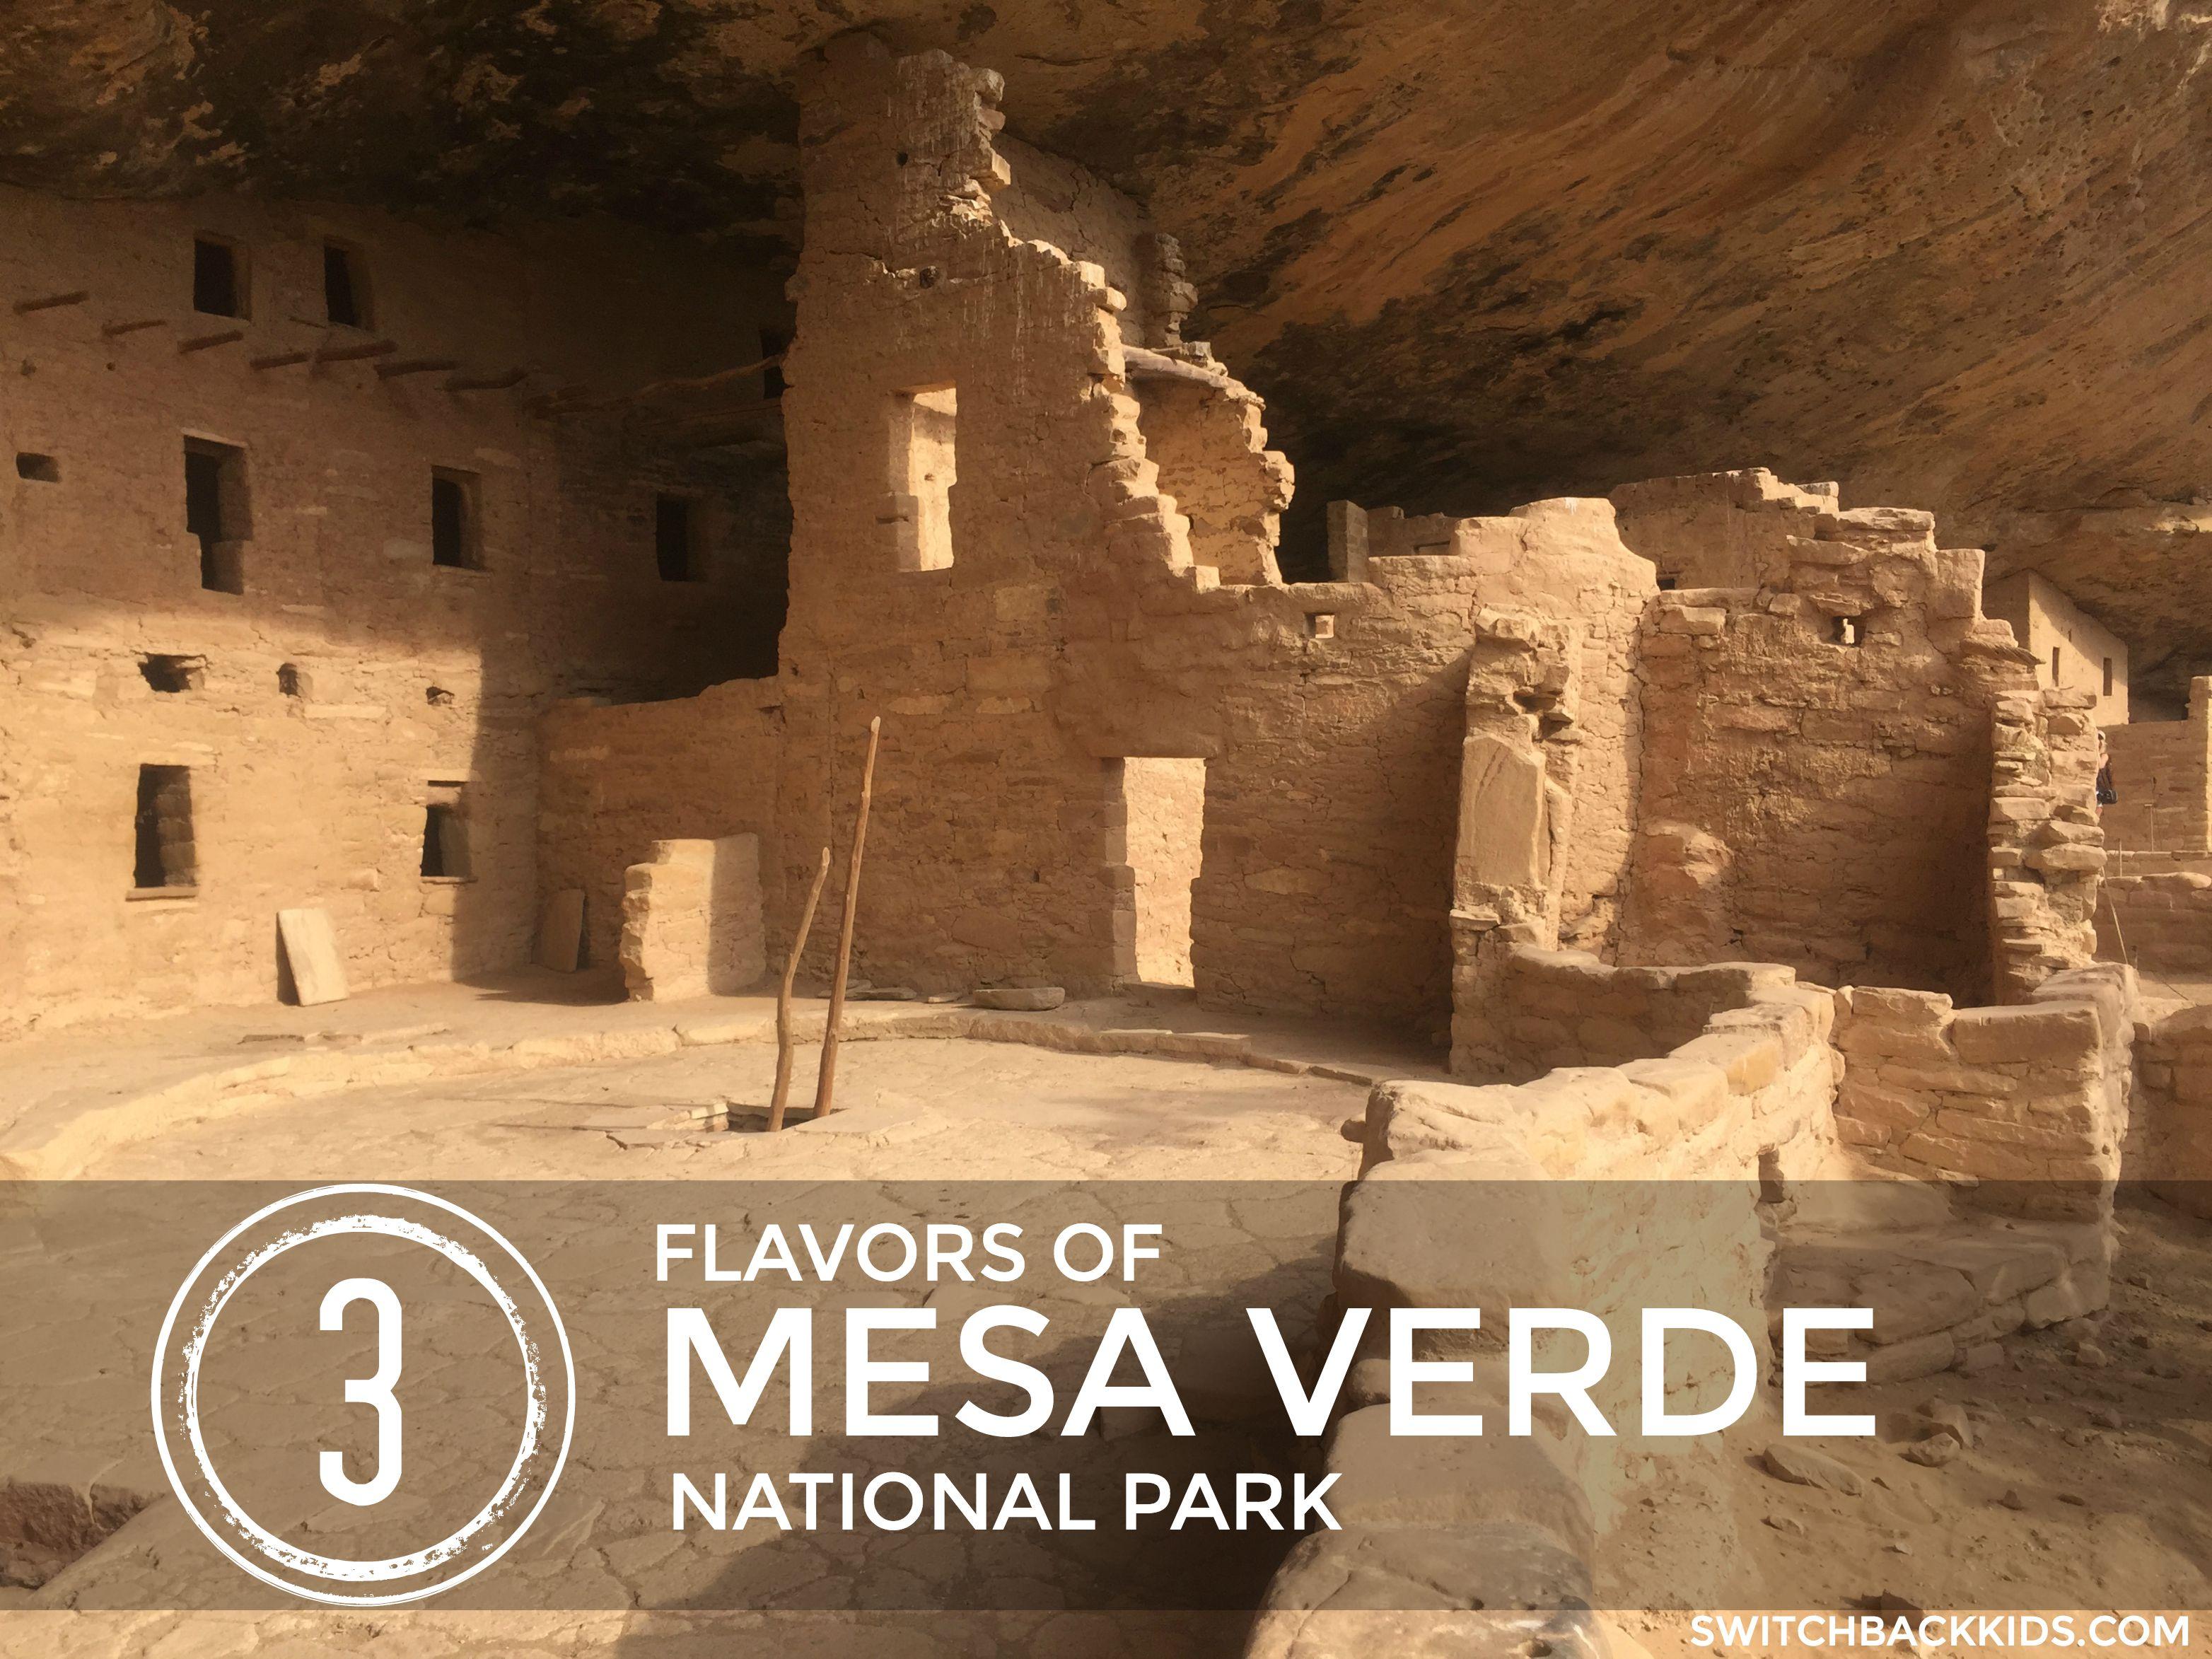 VIDEO: Mesa Verde National Park